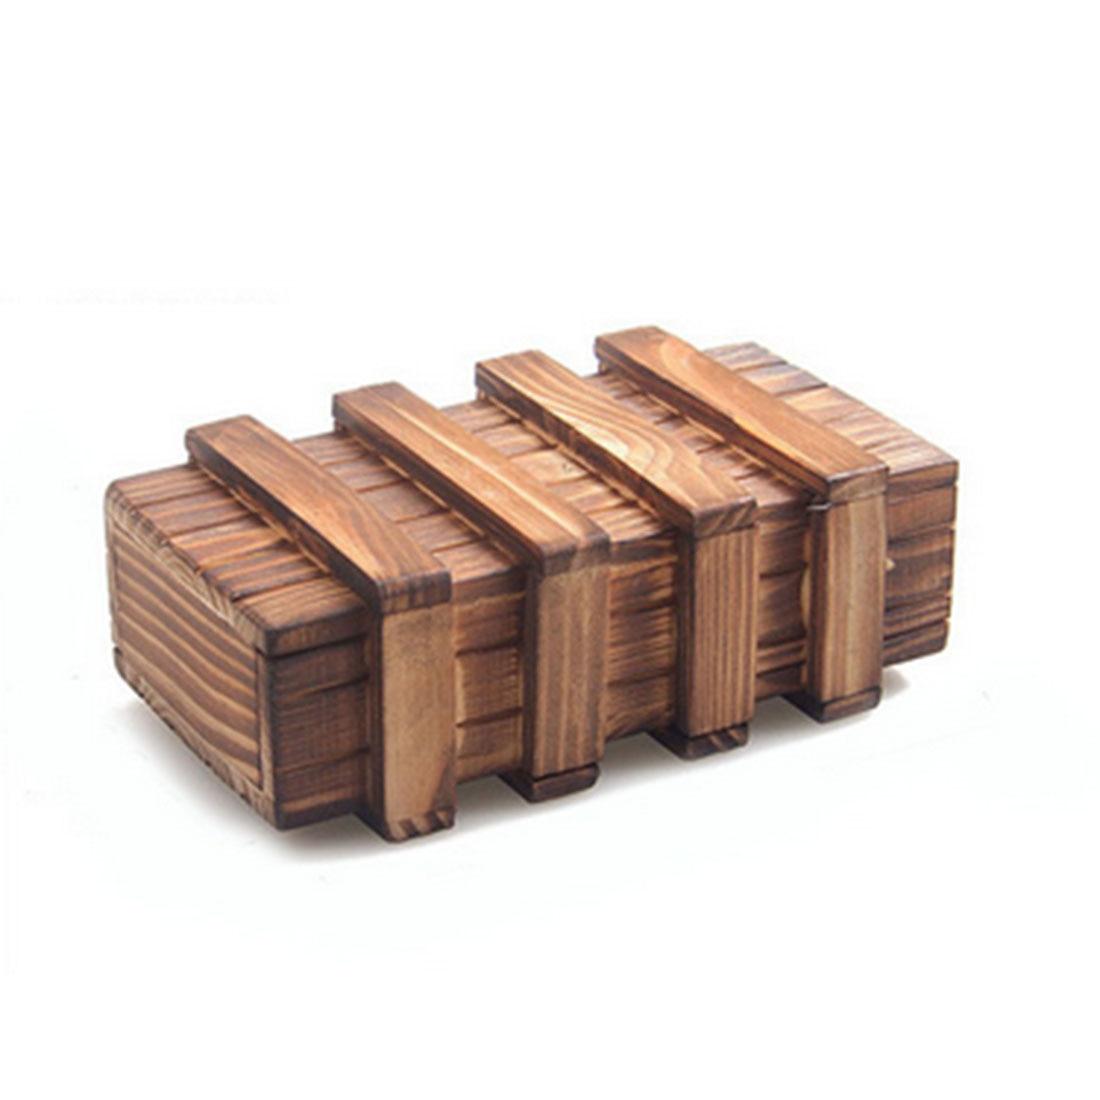 UTOYSLAND Secret Box Large Wooden Puzzle Box Secret Wood Drawer Magic Brain Teaser Educational Toys for Child ...